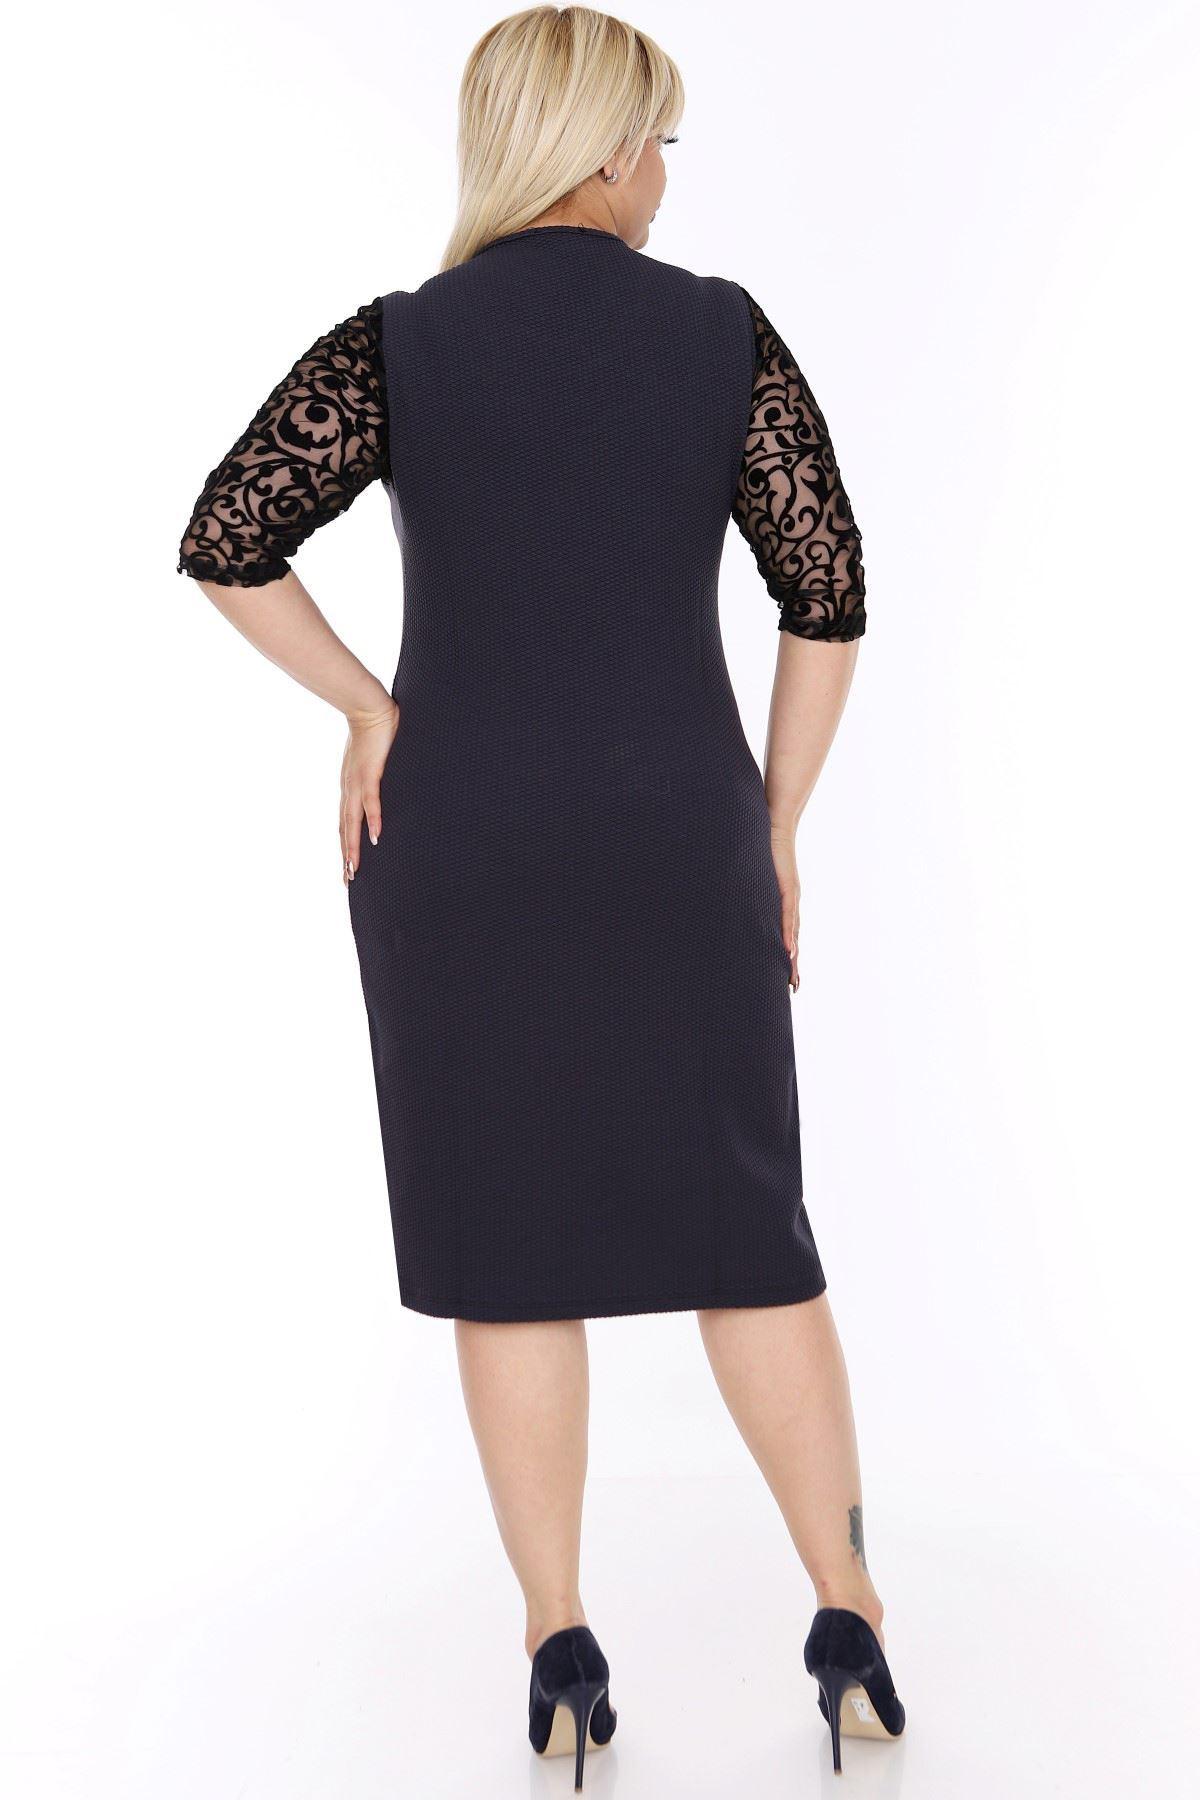 Lacivert Yetim Kol Elbise 1C-0434